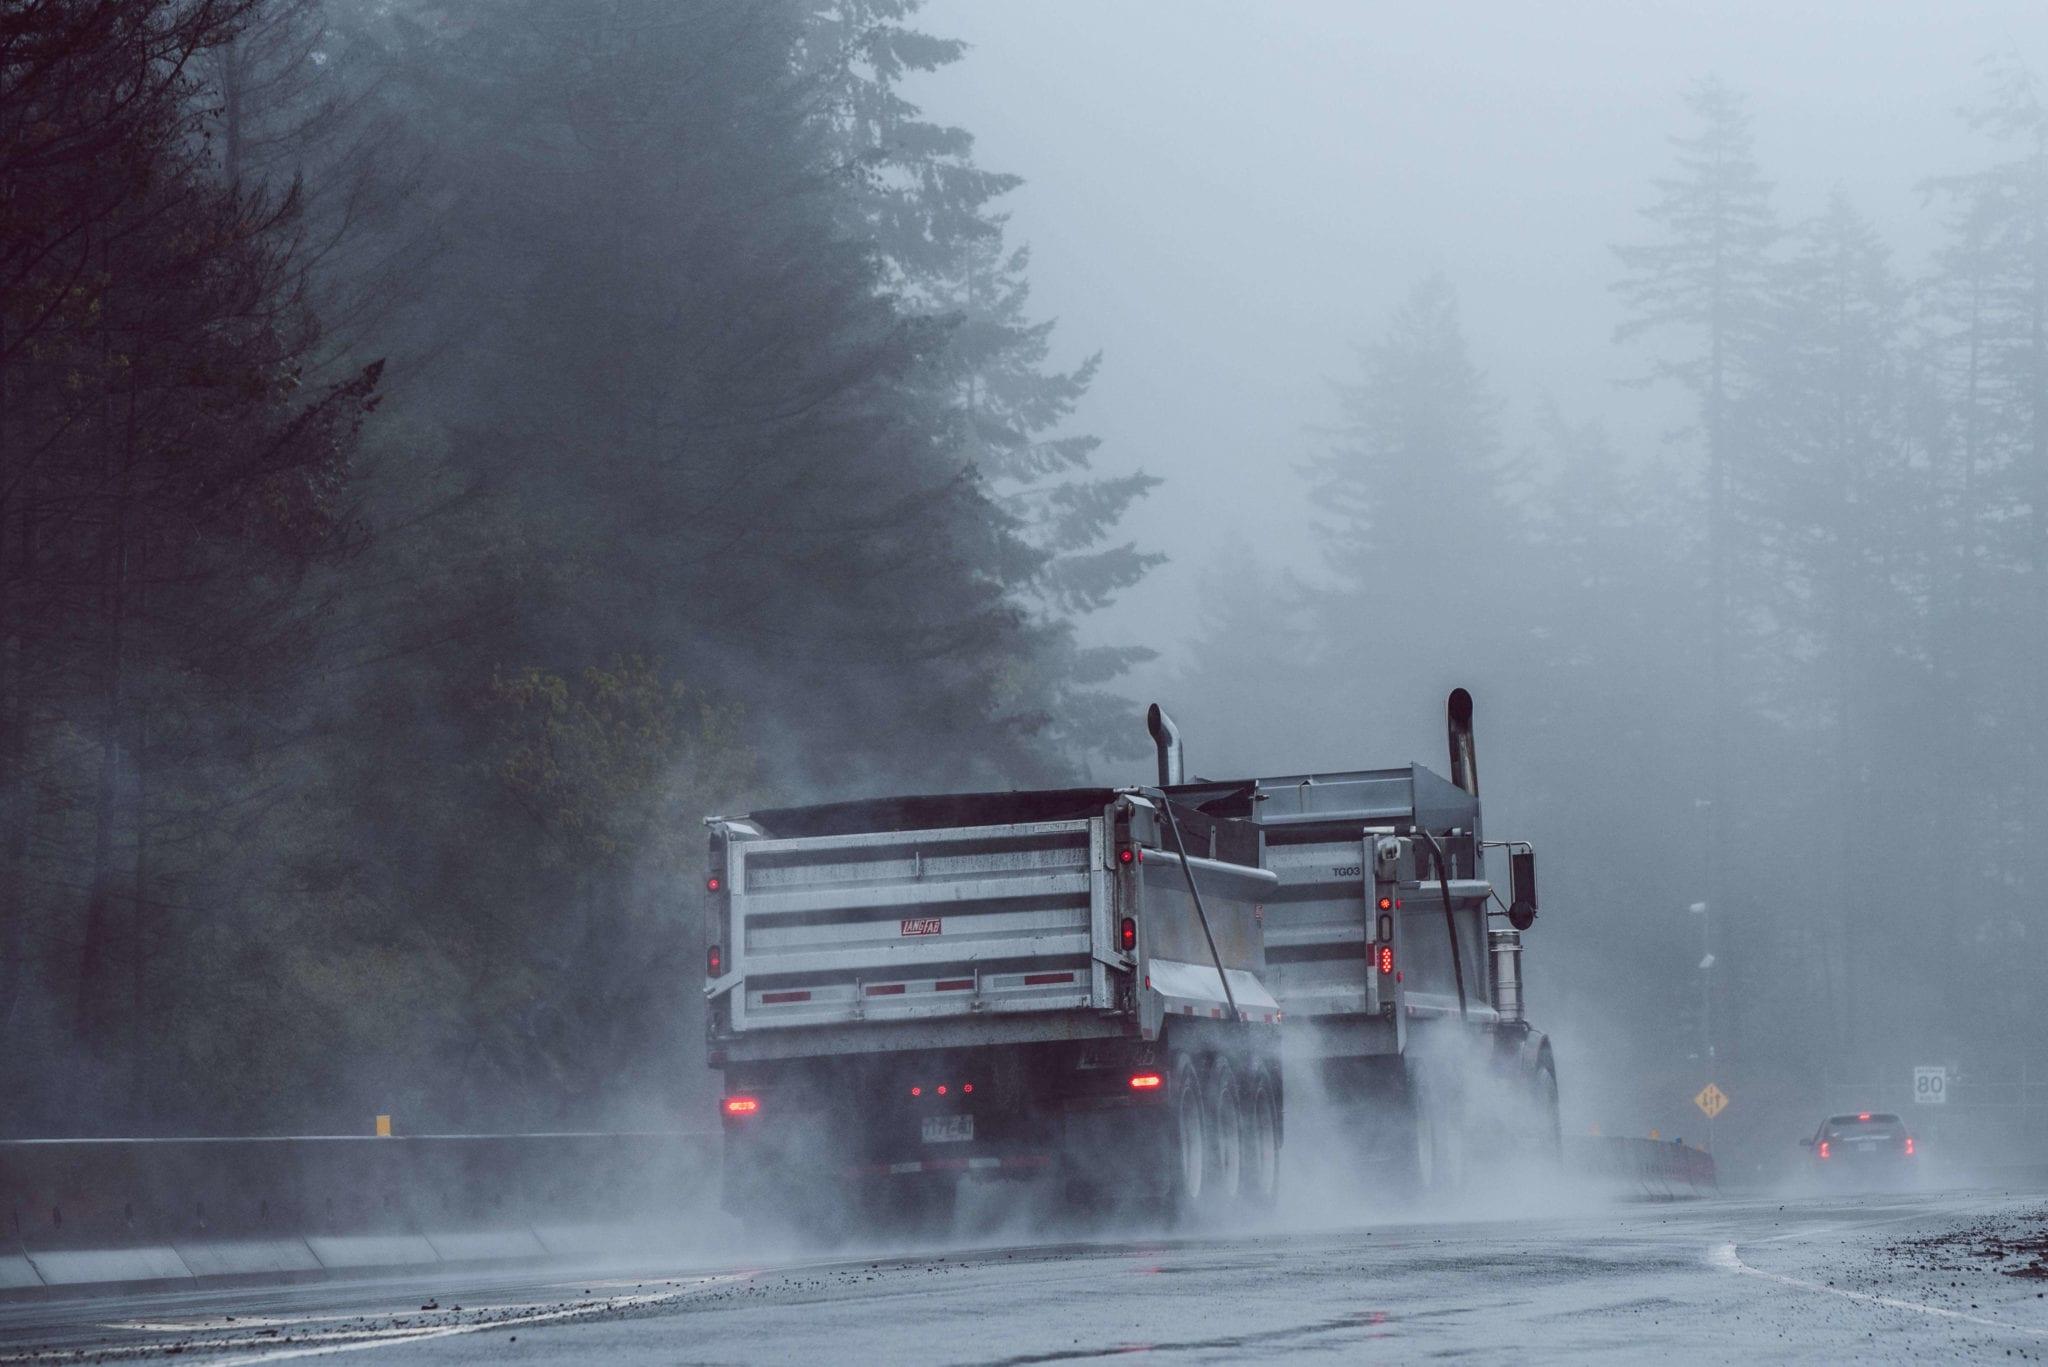 Trucker fatigue rears its ugly head, again